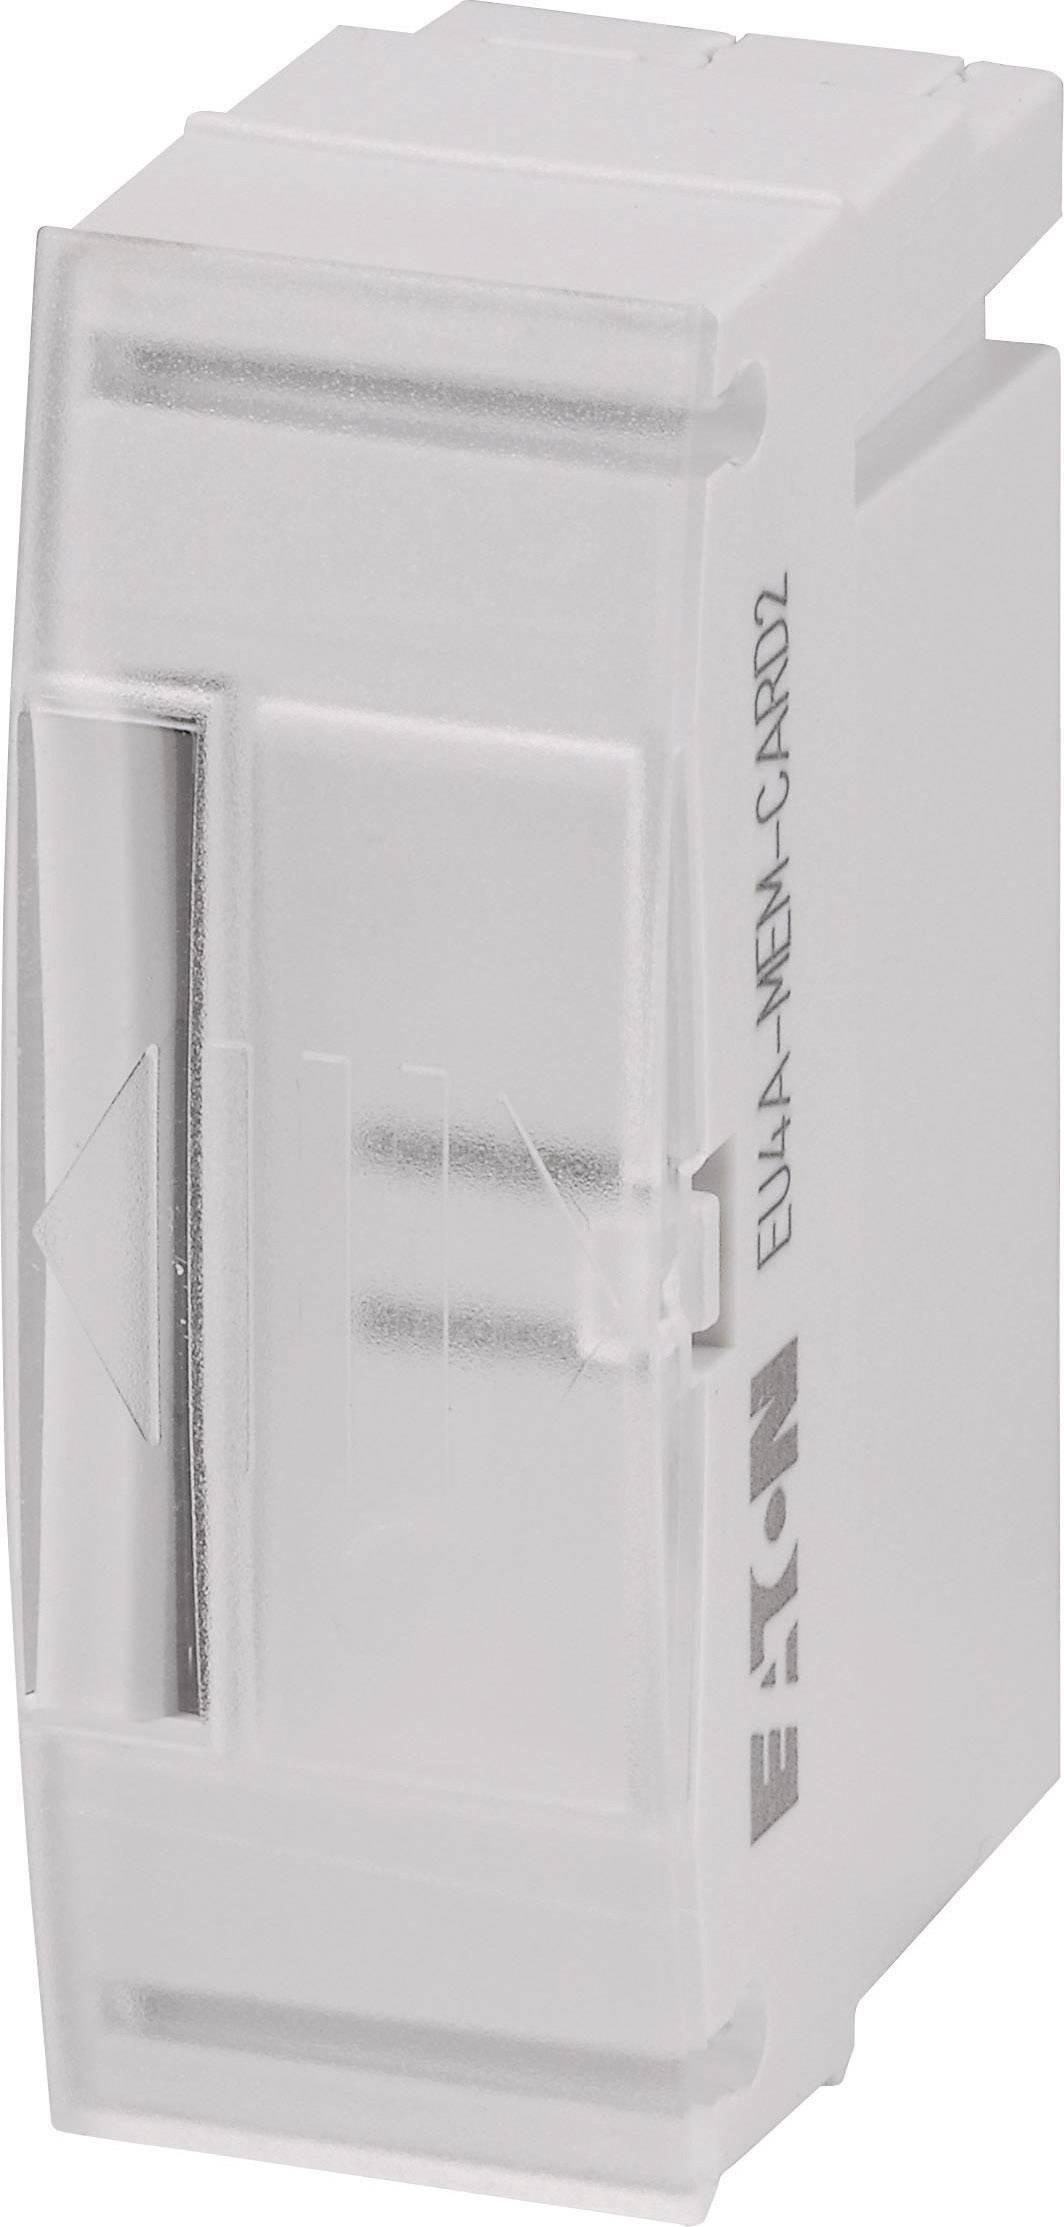 Pamäťovýmodul Eaton EU4A-Mem-Card 106409